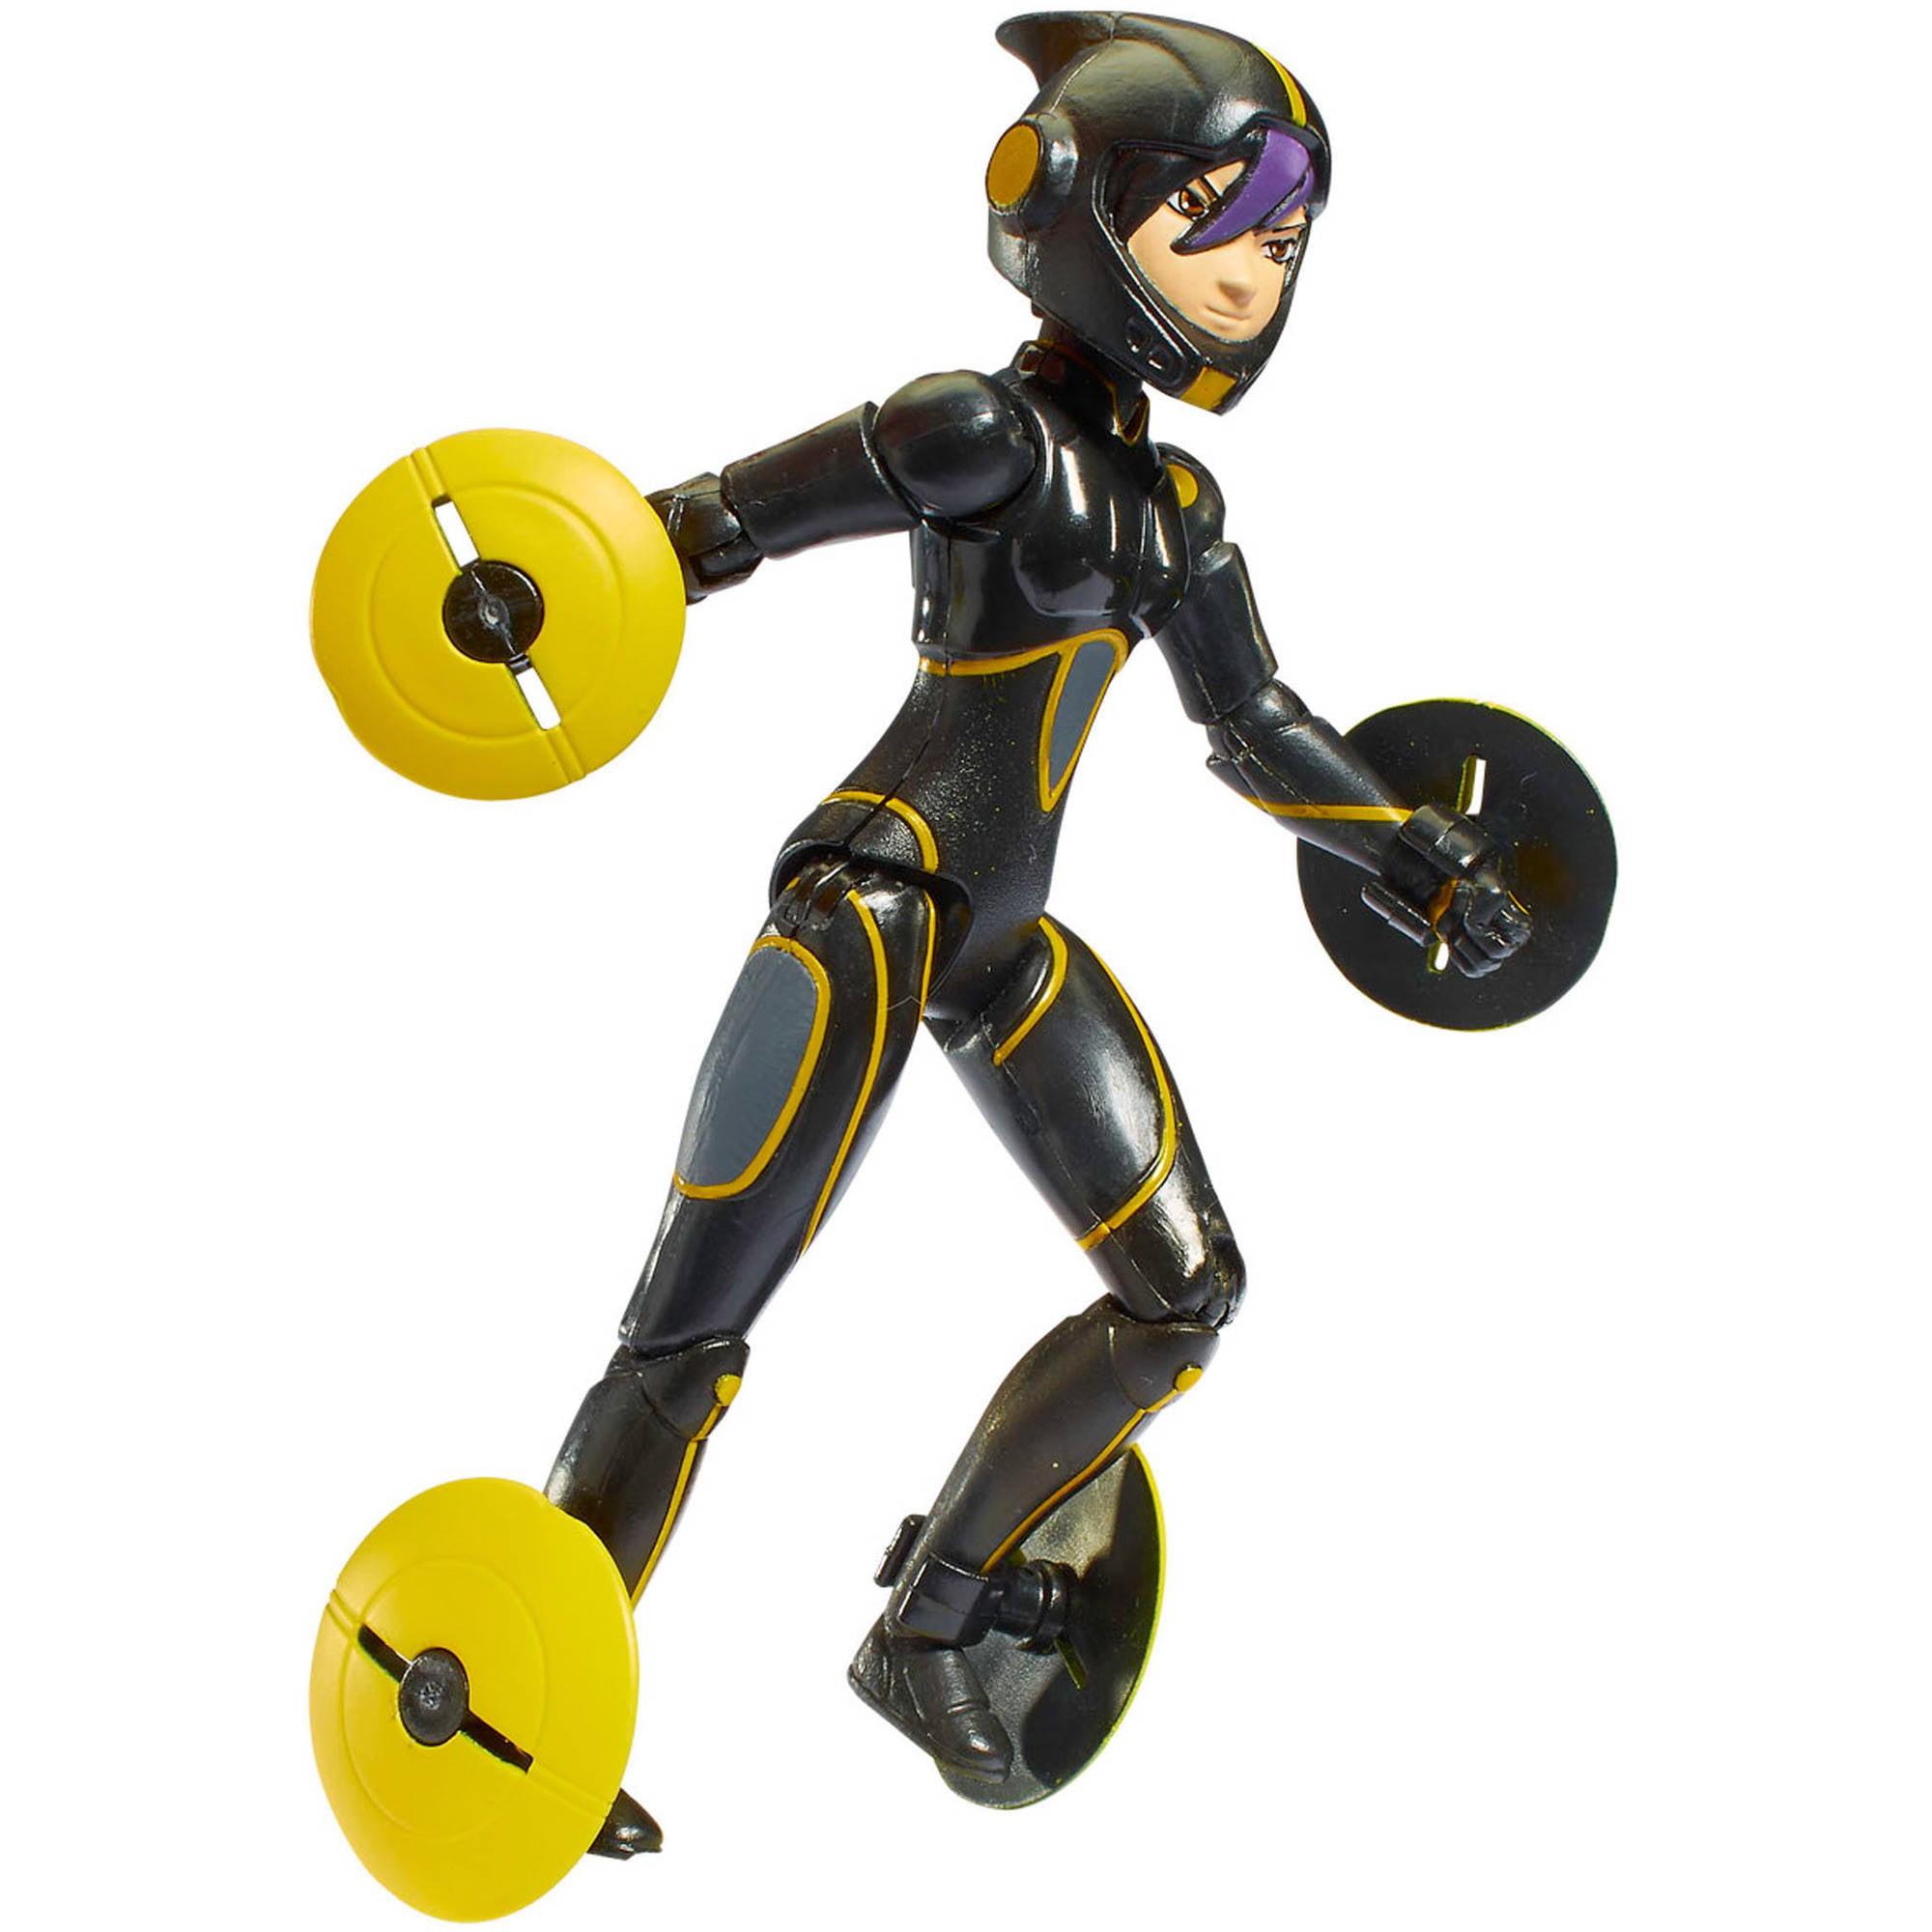 Bandai America Big Hero 6 Basic Figures Stealth Go Go Tomago Walmart Com Walmart Com